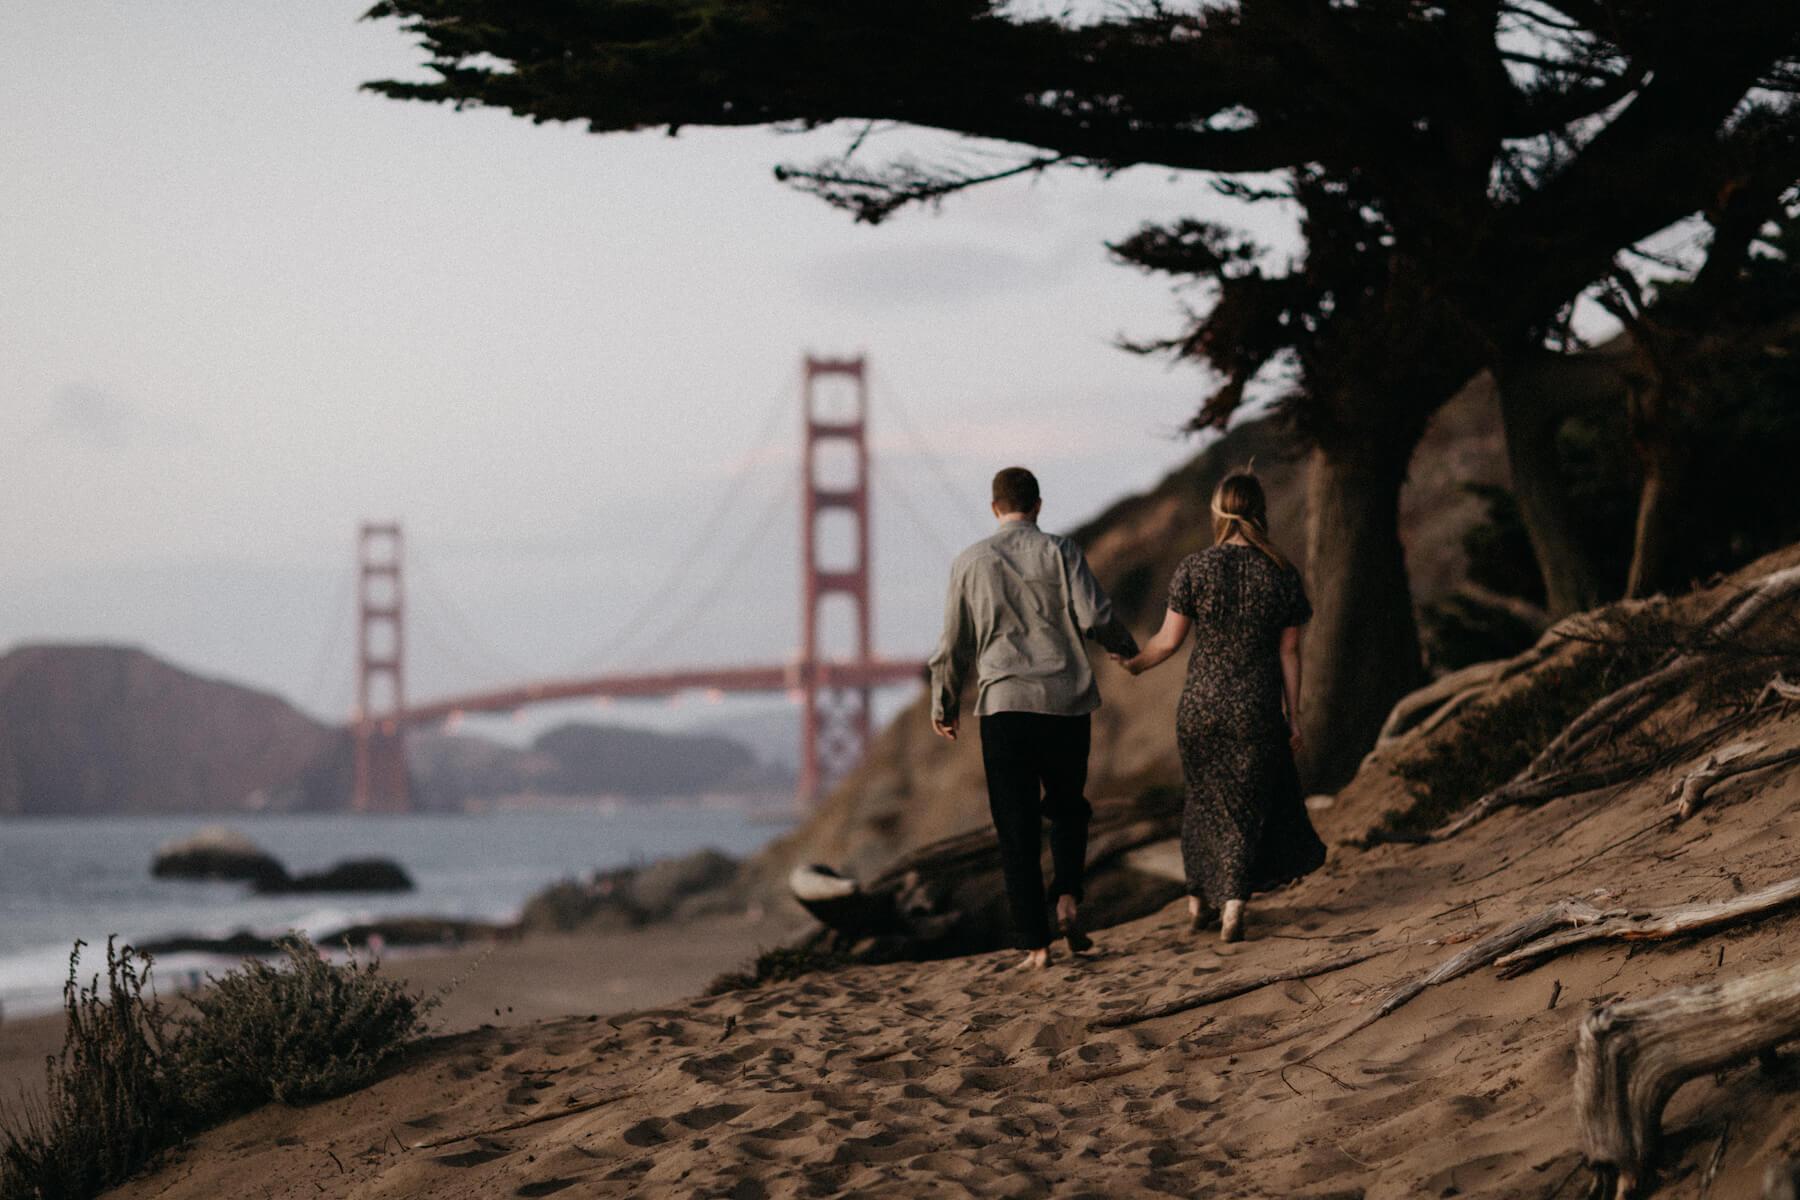 san-francisco-09-29-2019-couples-trip-60_original